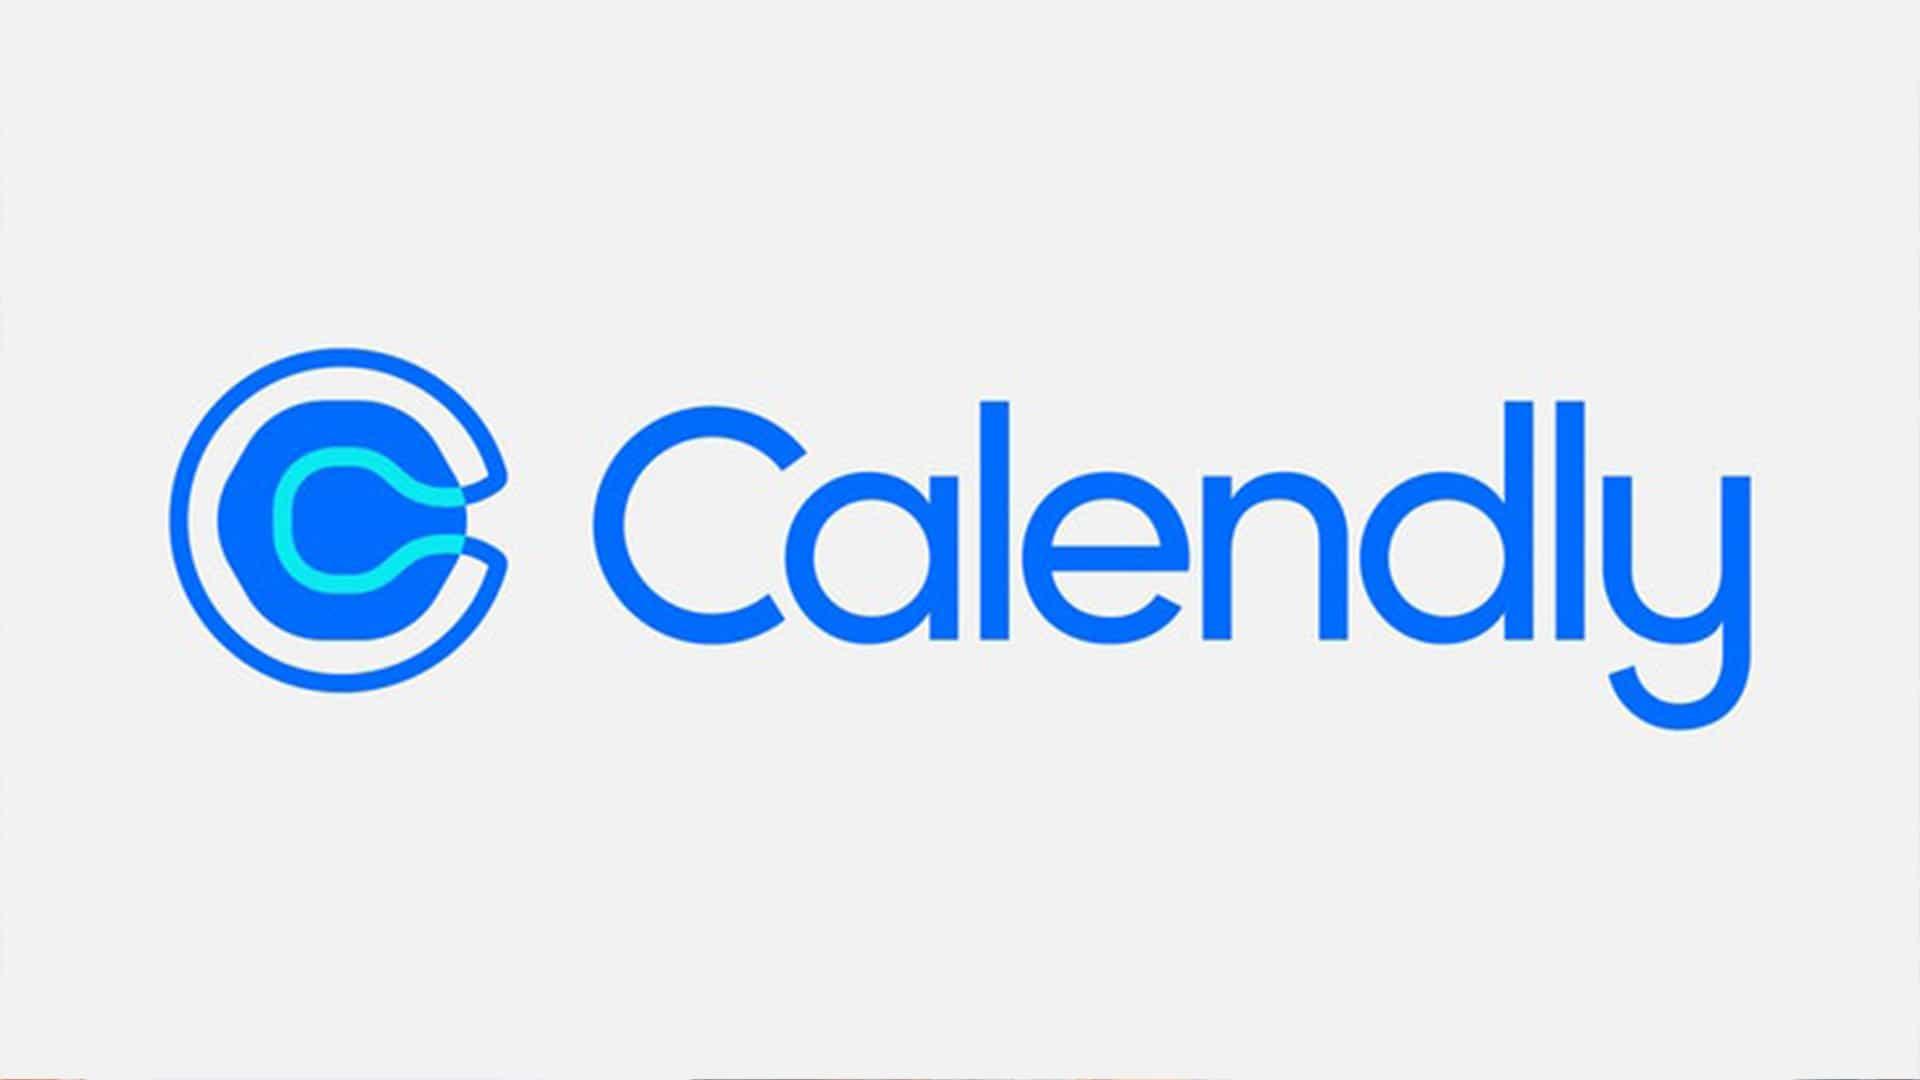 Nuevo logo de Calendly brutalmente burlado por desafortunado parecido